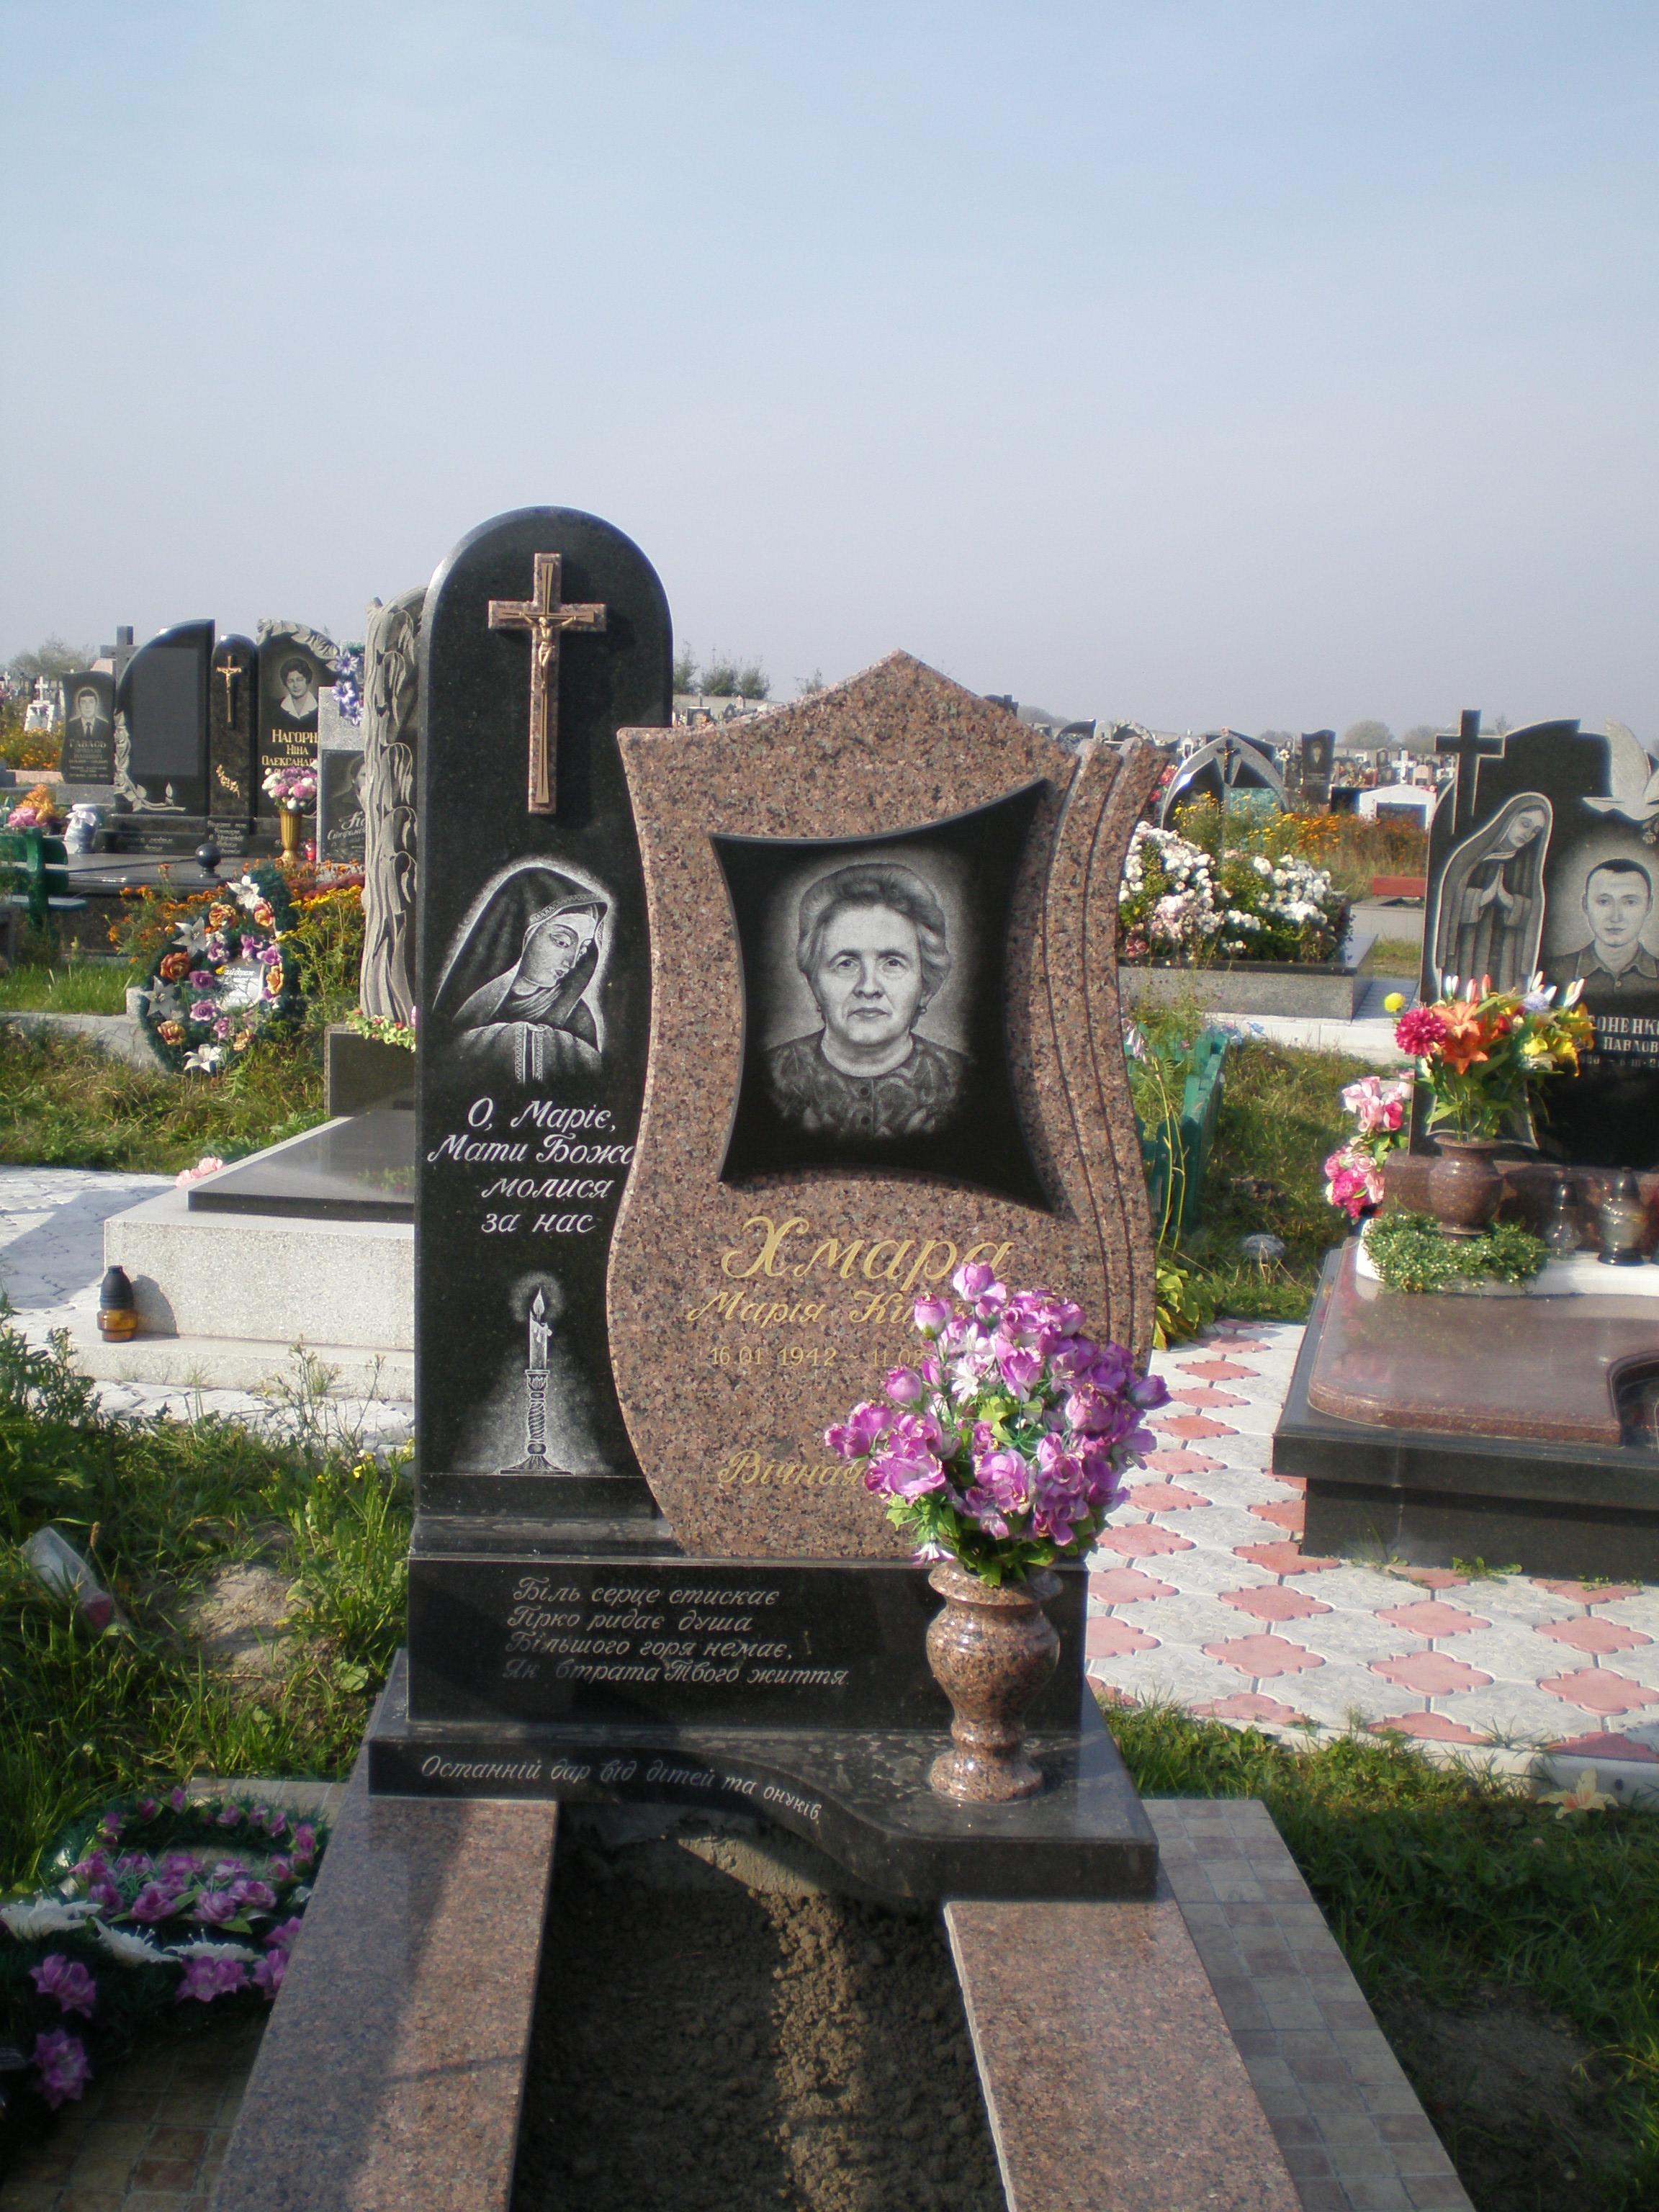 http://files.ub.ua/gallery/photos/2/733396_725ePA110052.JPG